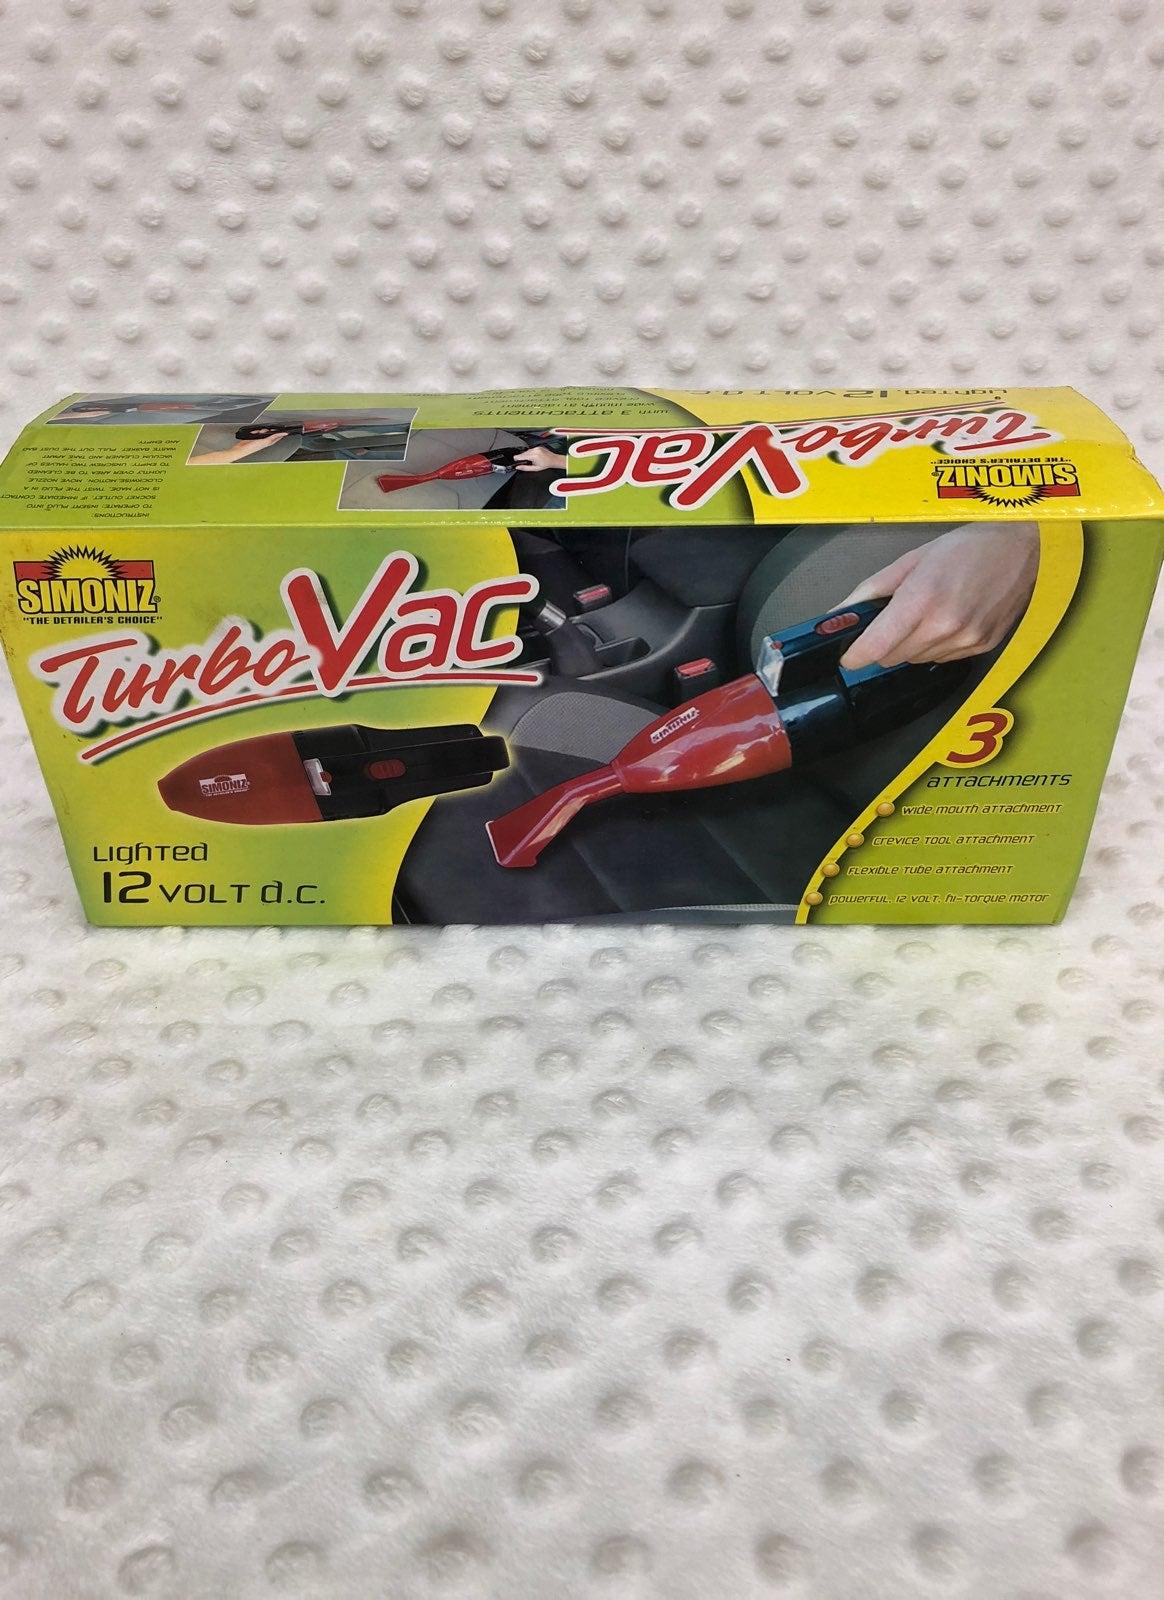 Simoniz Hand Held Turbo VAC 12 Vol